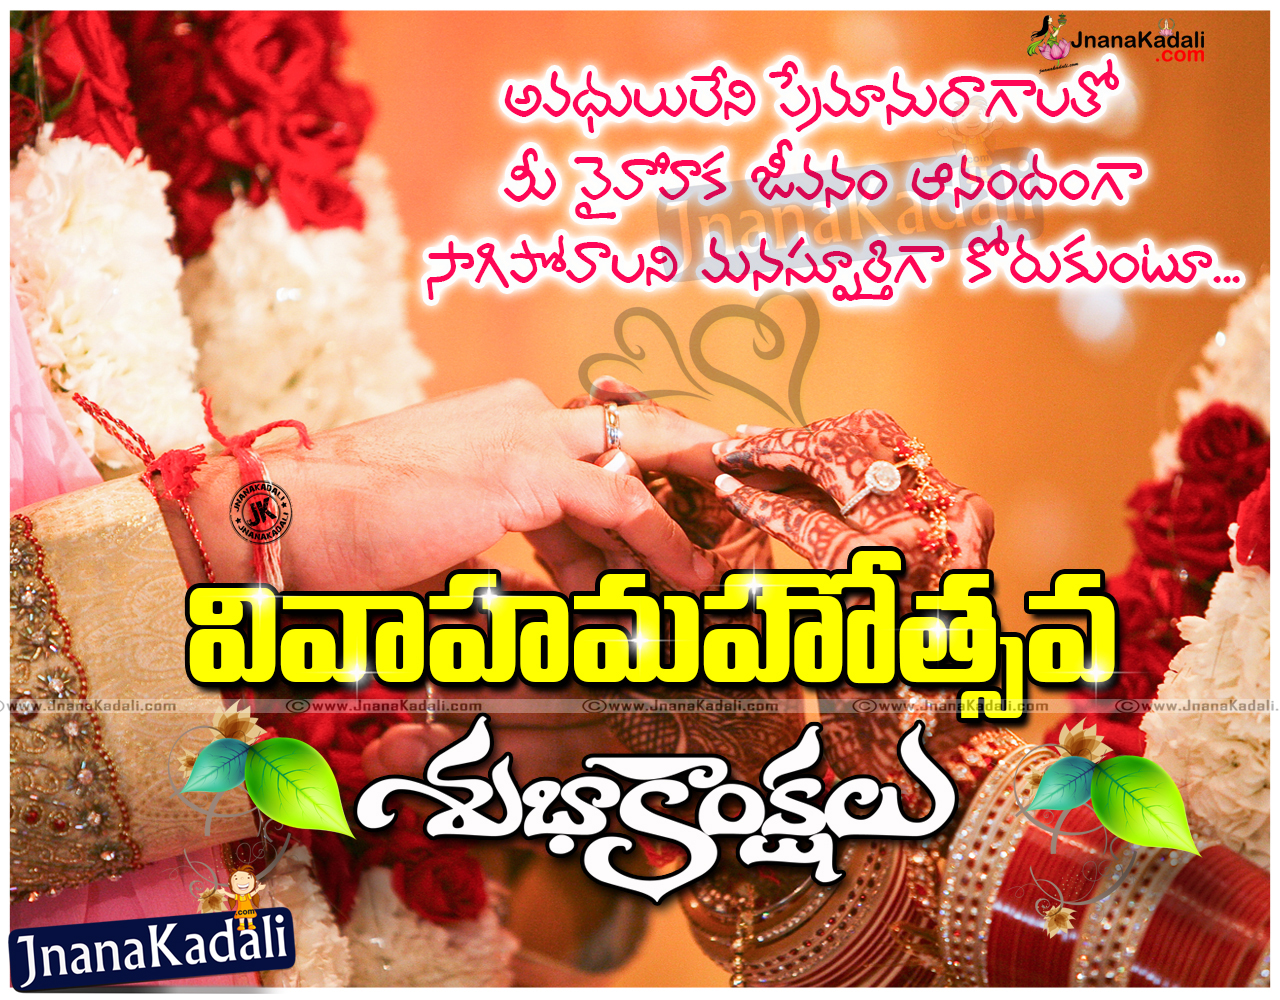 Marriage day greetings sms greetings and wishes jnana kadali telugu quotesenglish quotes kristyandbryce Choice Image